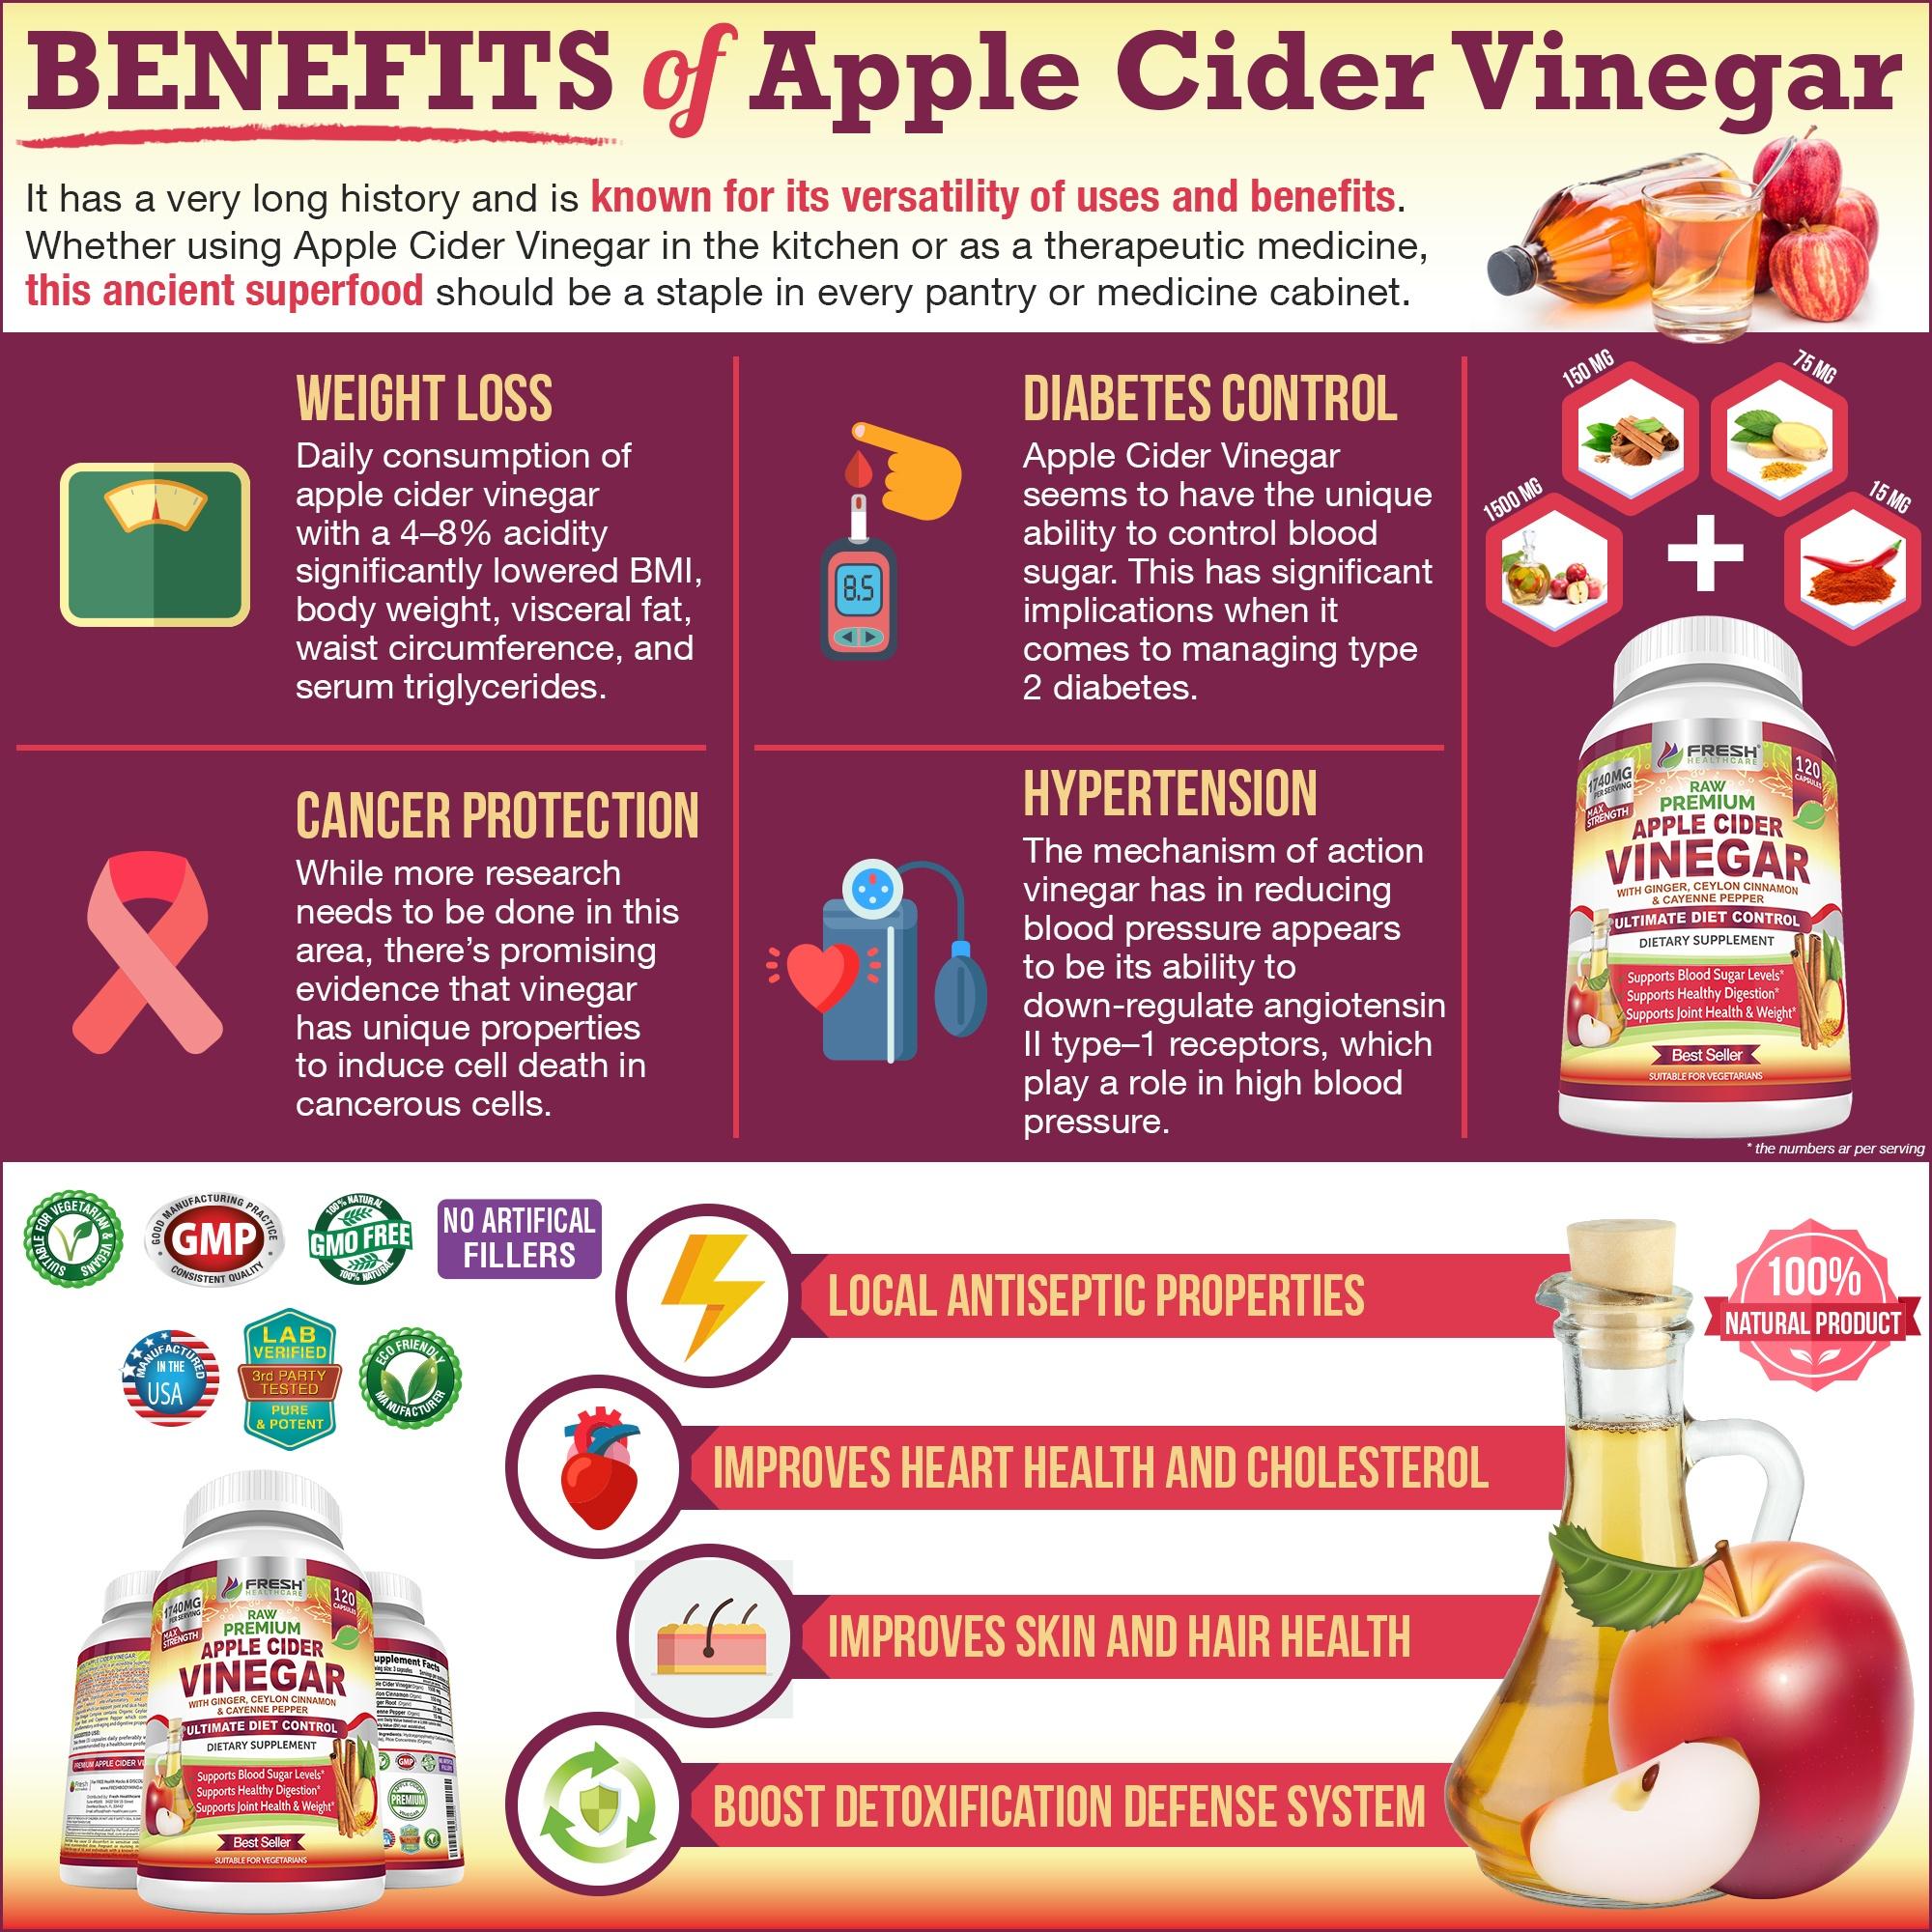 Apple-Cider-Vinegar-Infographic